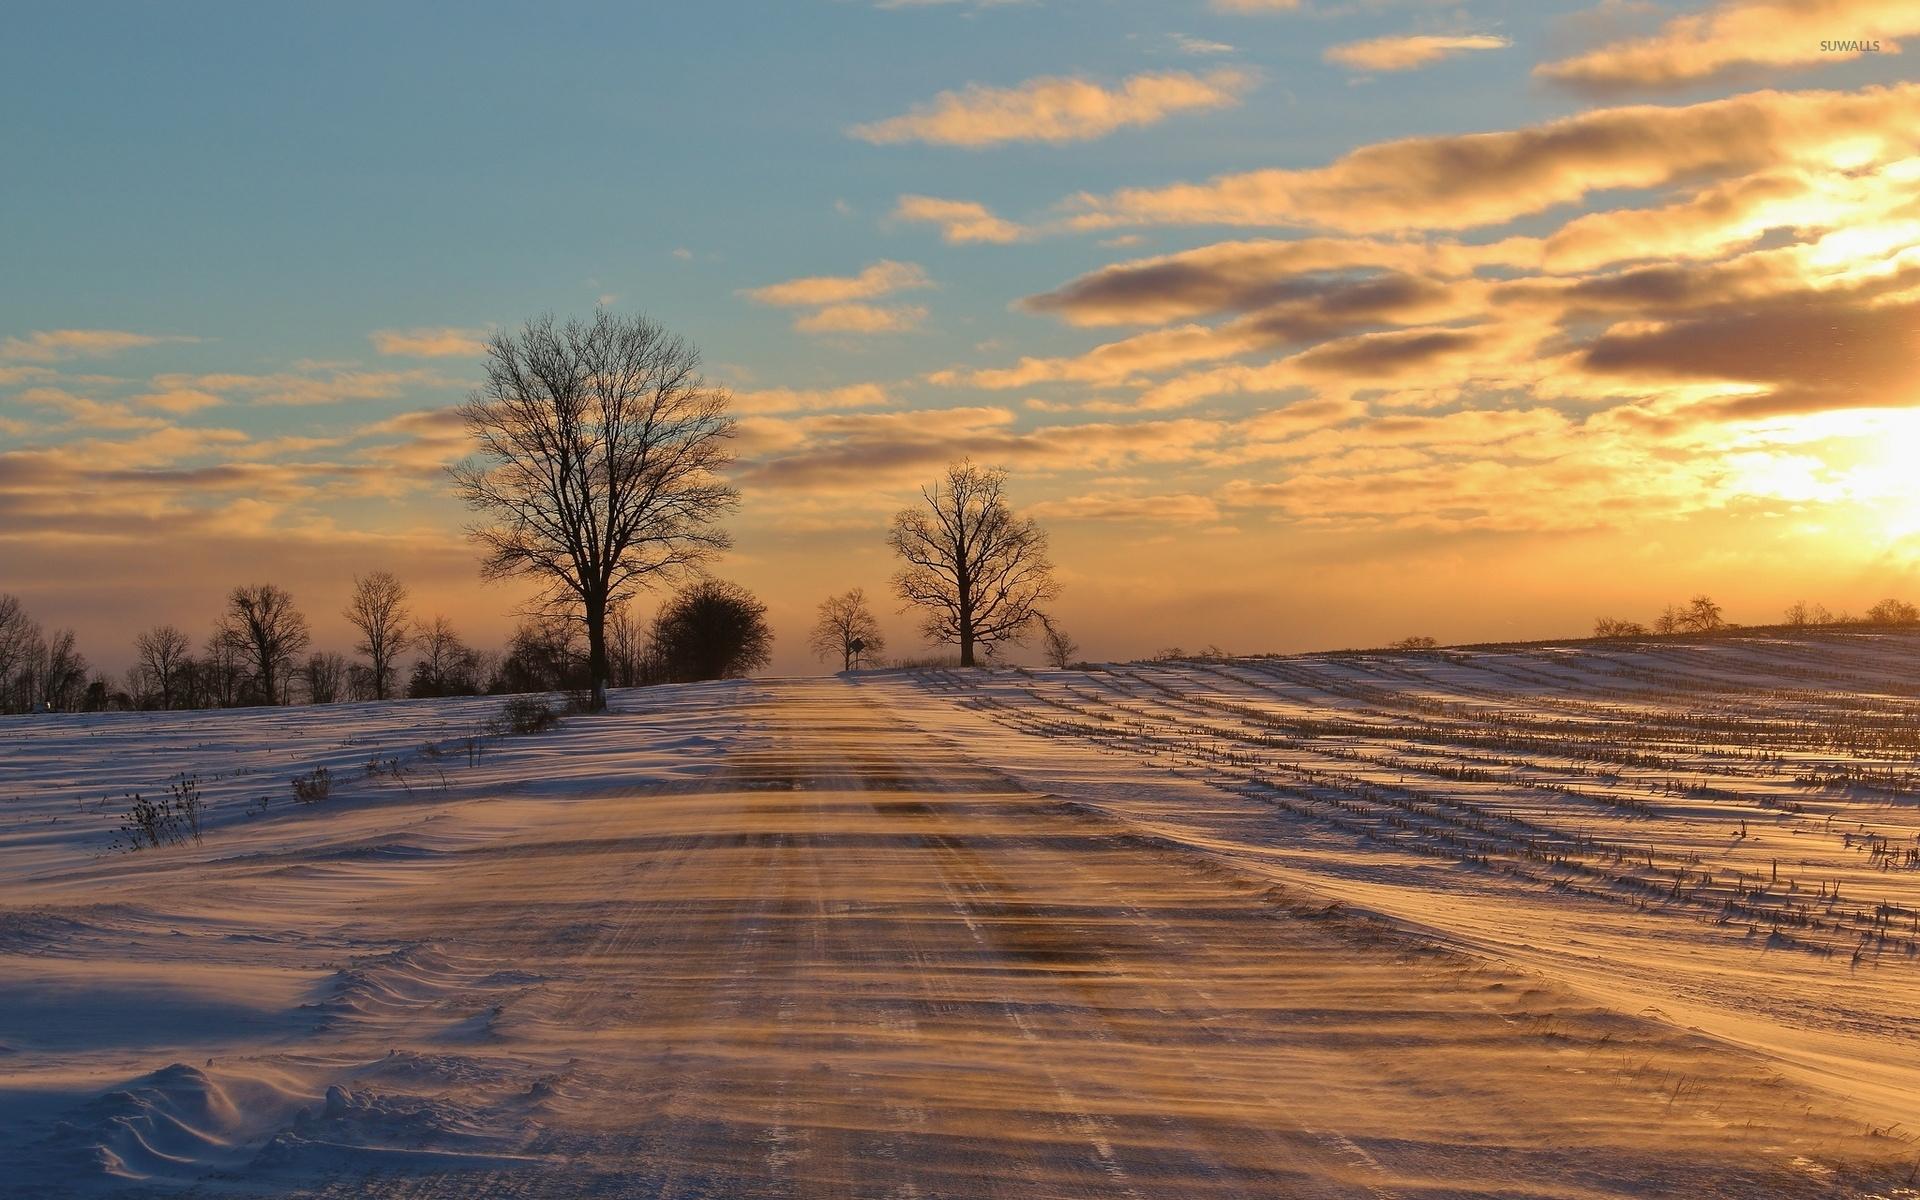 Закат дорога зима бесплатно